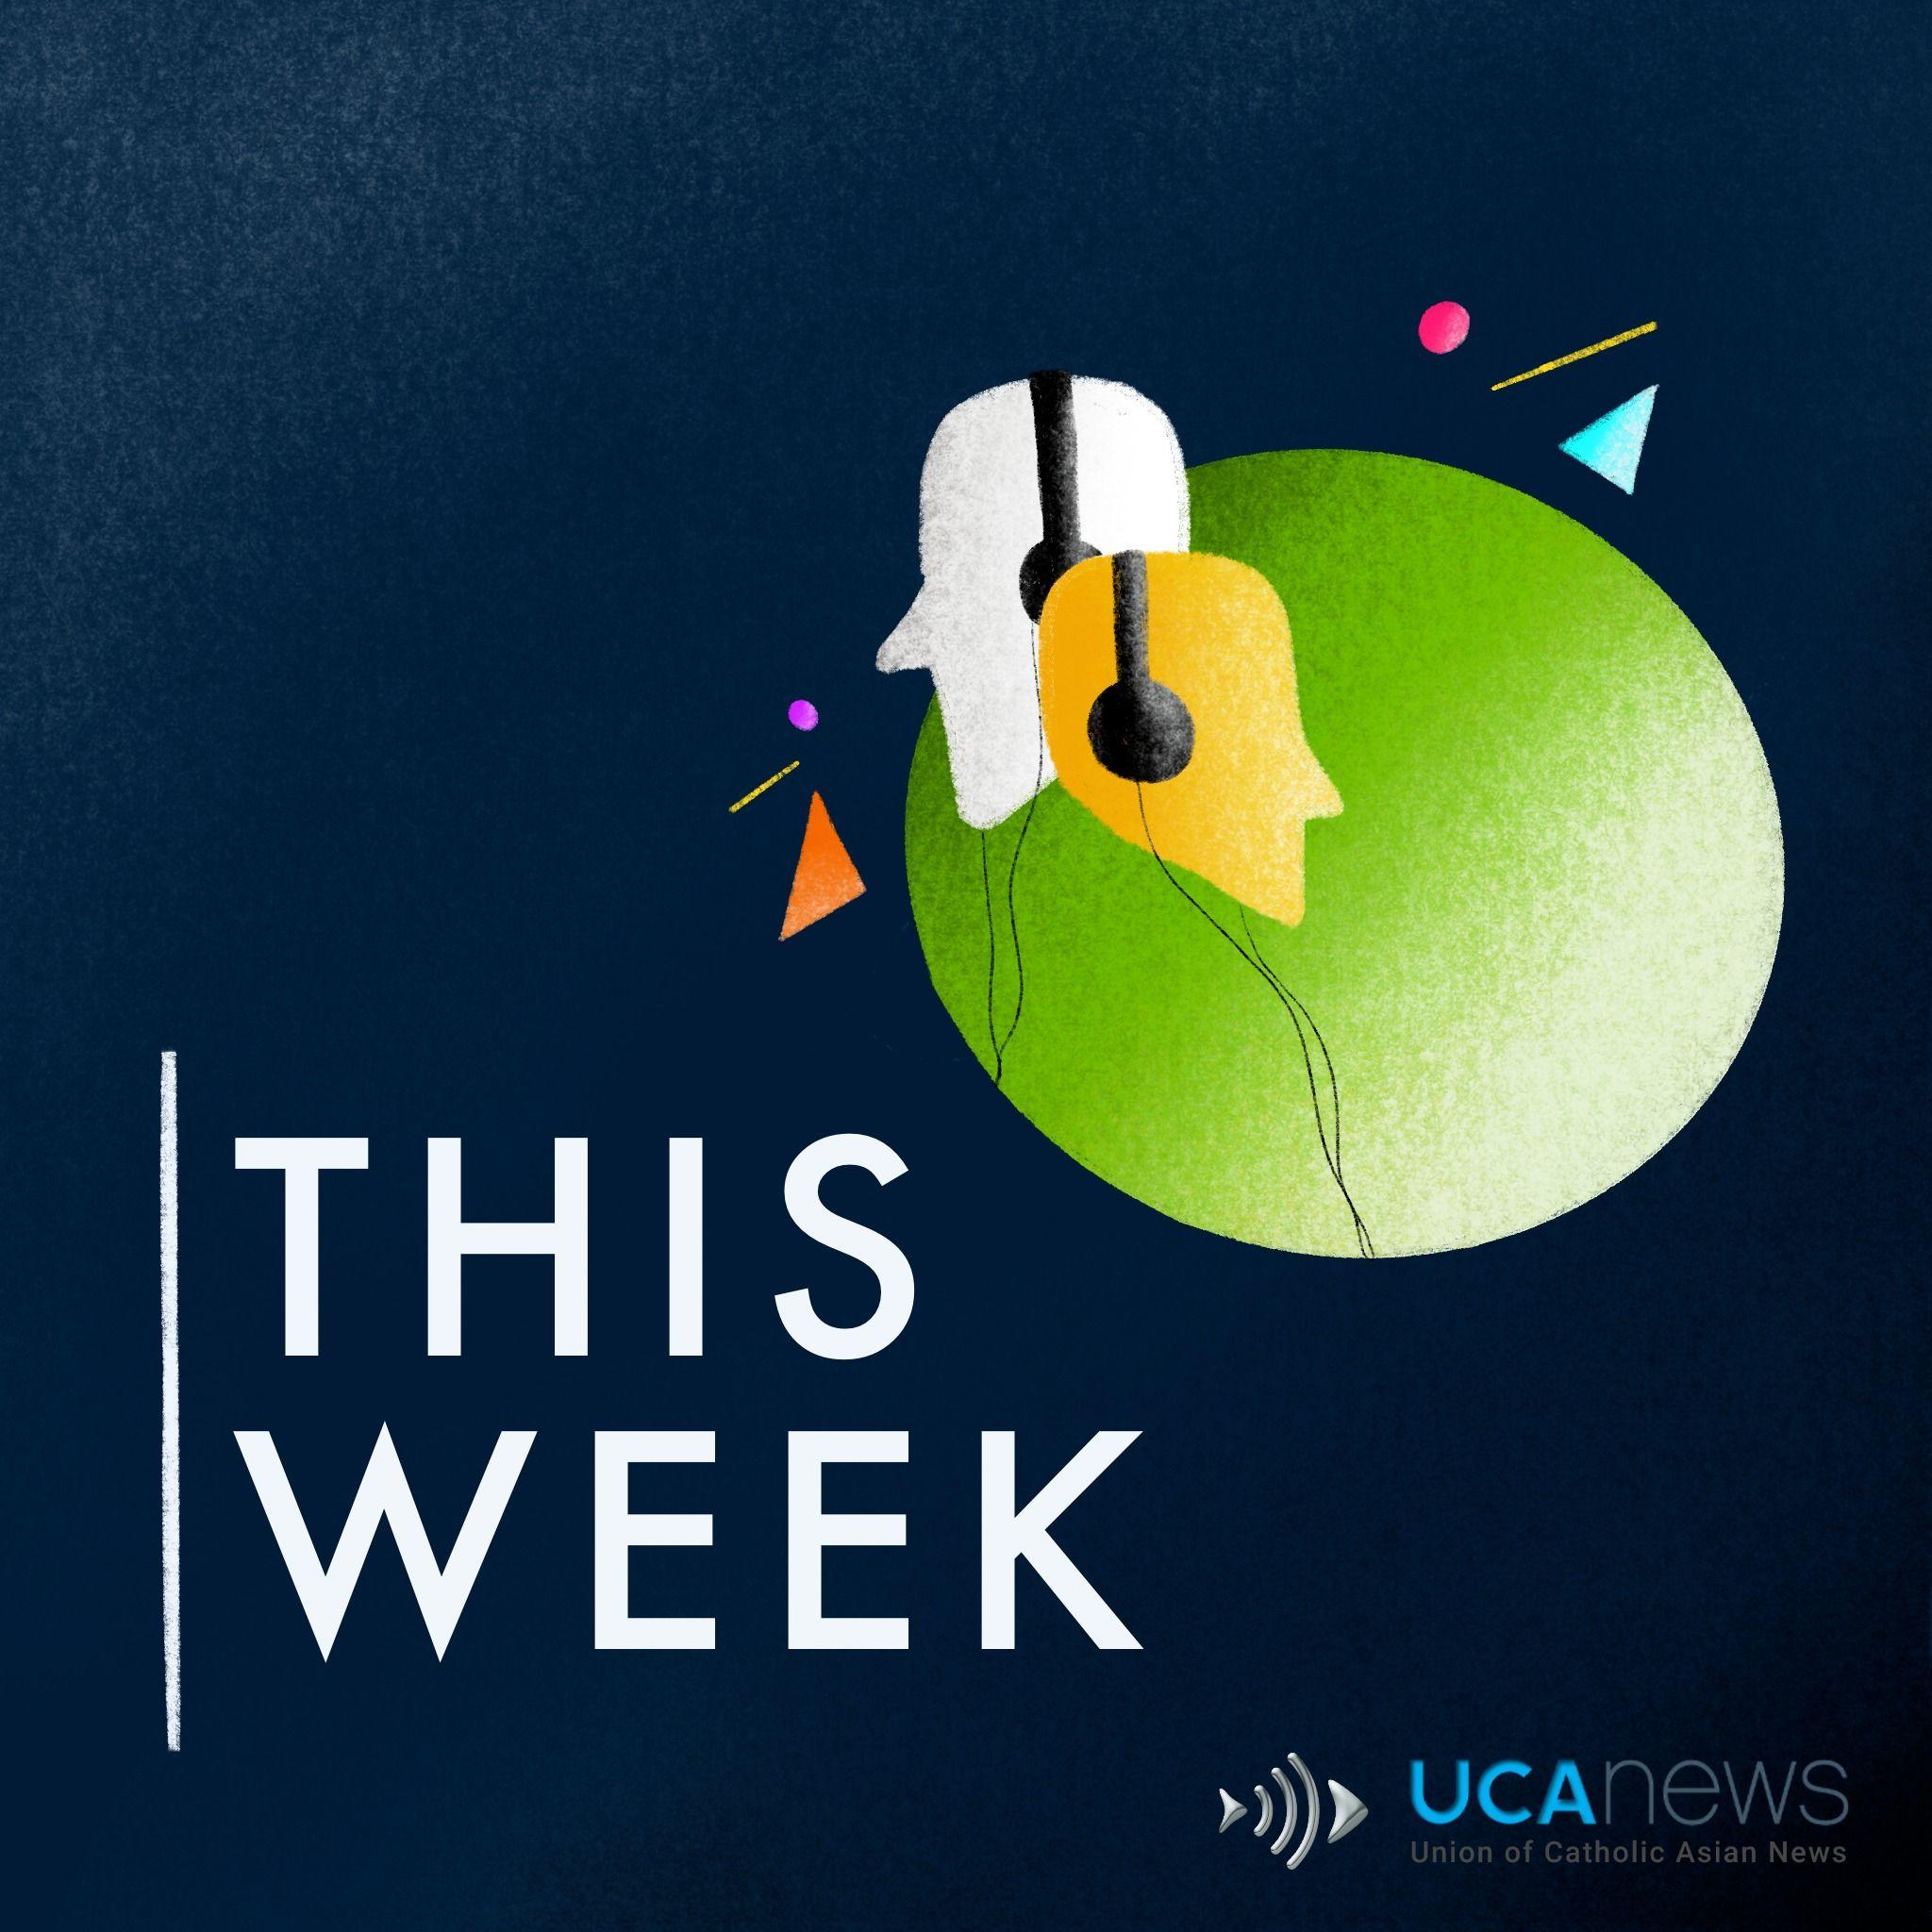 UCA News Weekly Summary, February 26, 2021